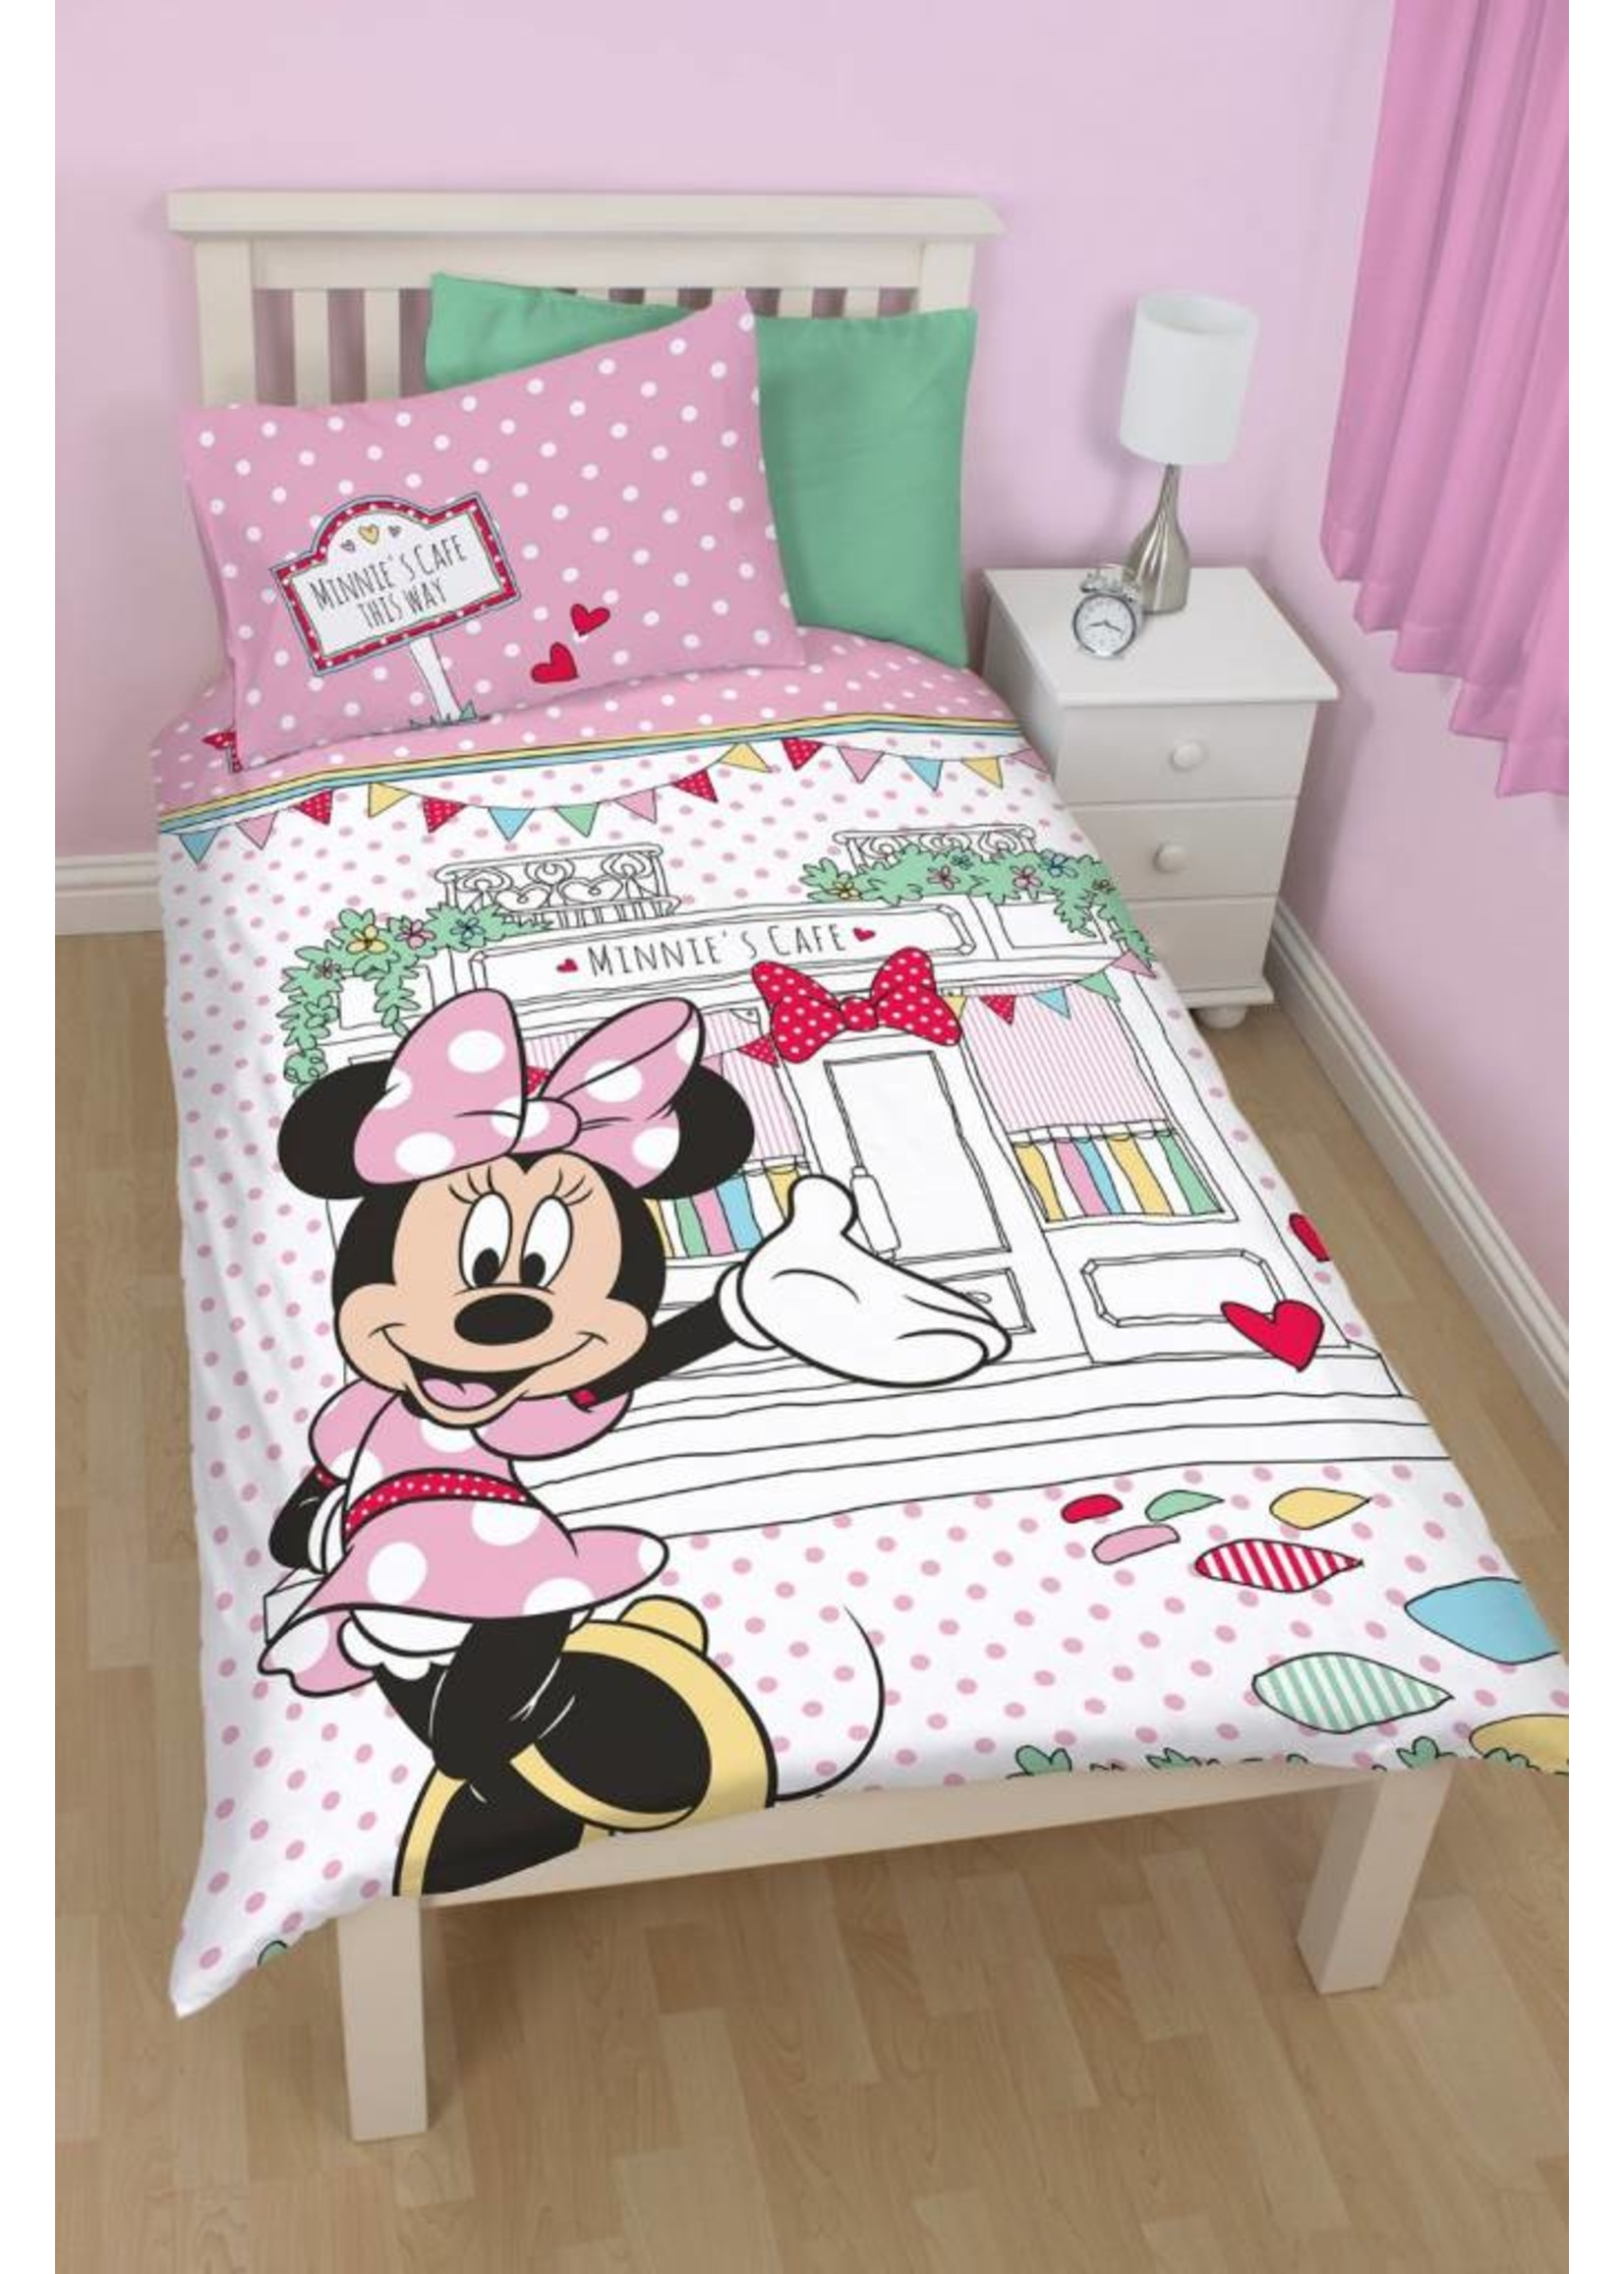 Disney Minnie Mouse Dekbedovertrek Cafe